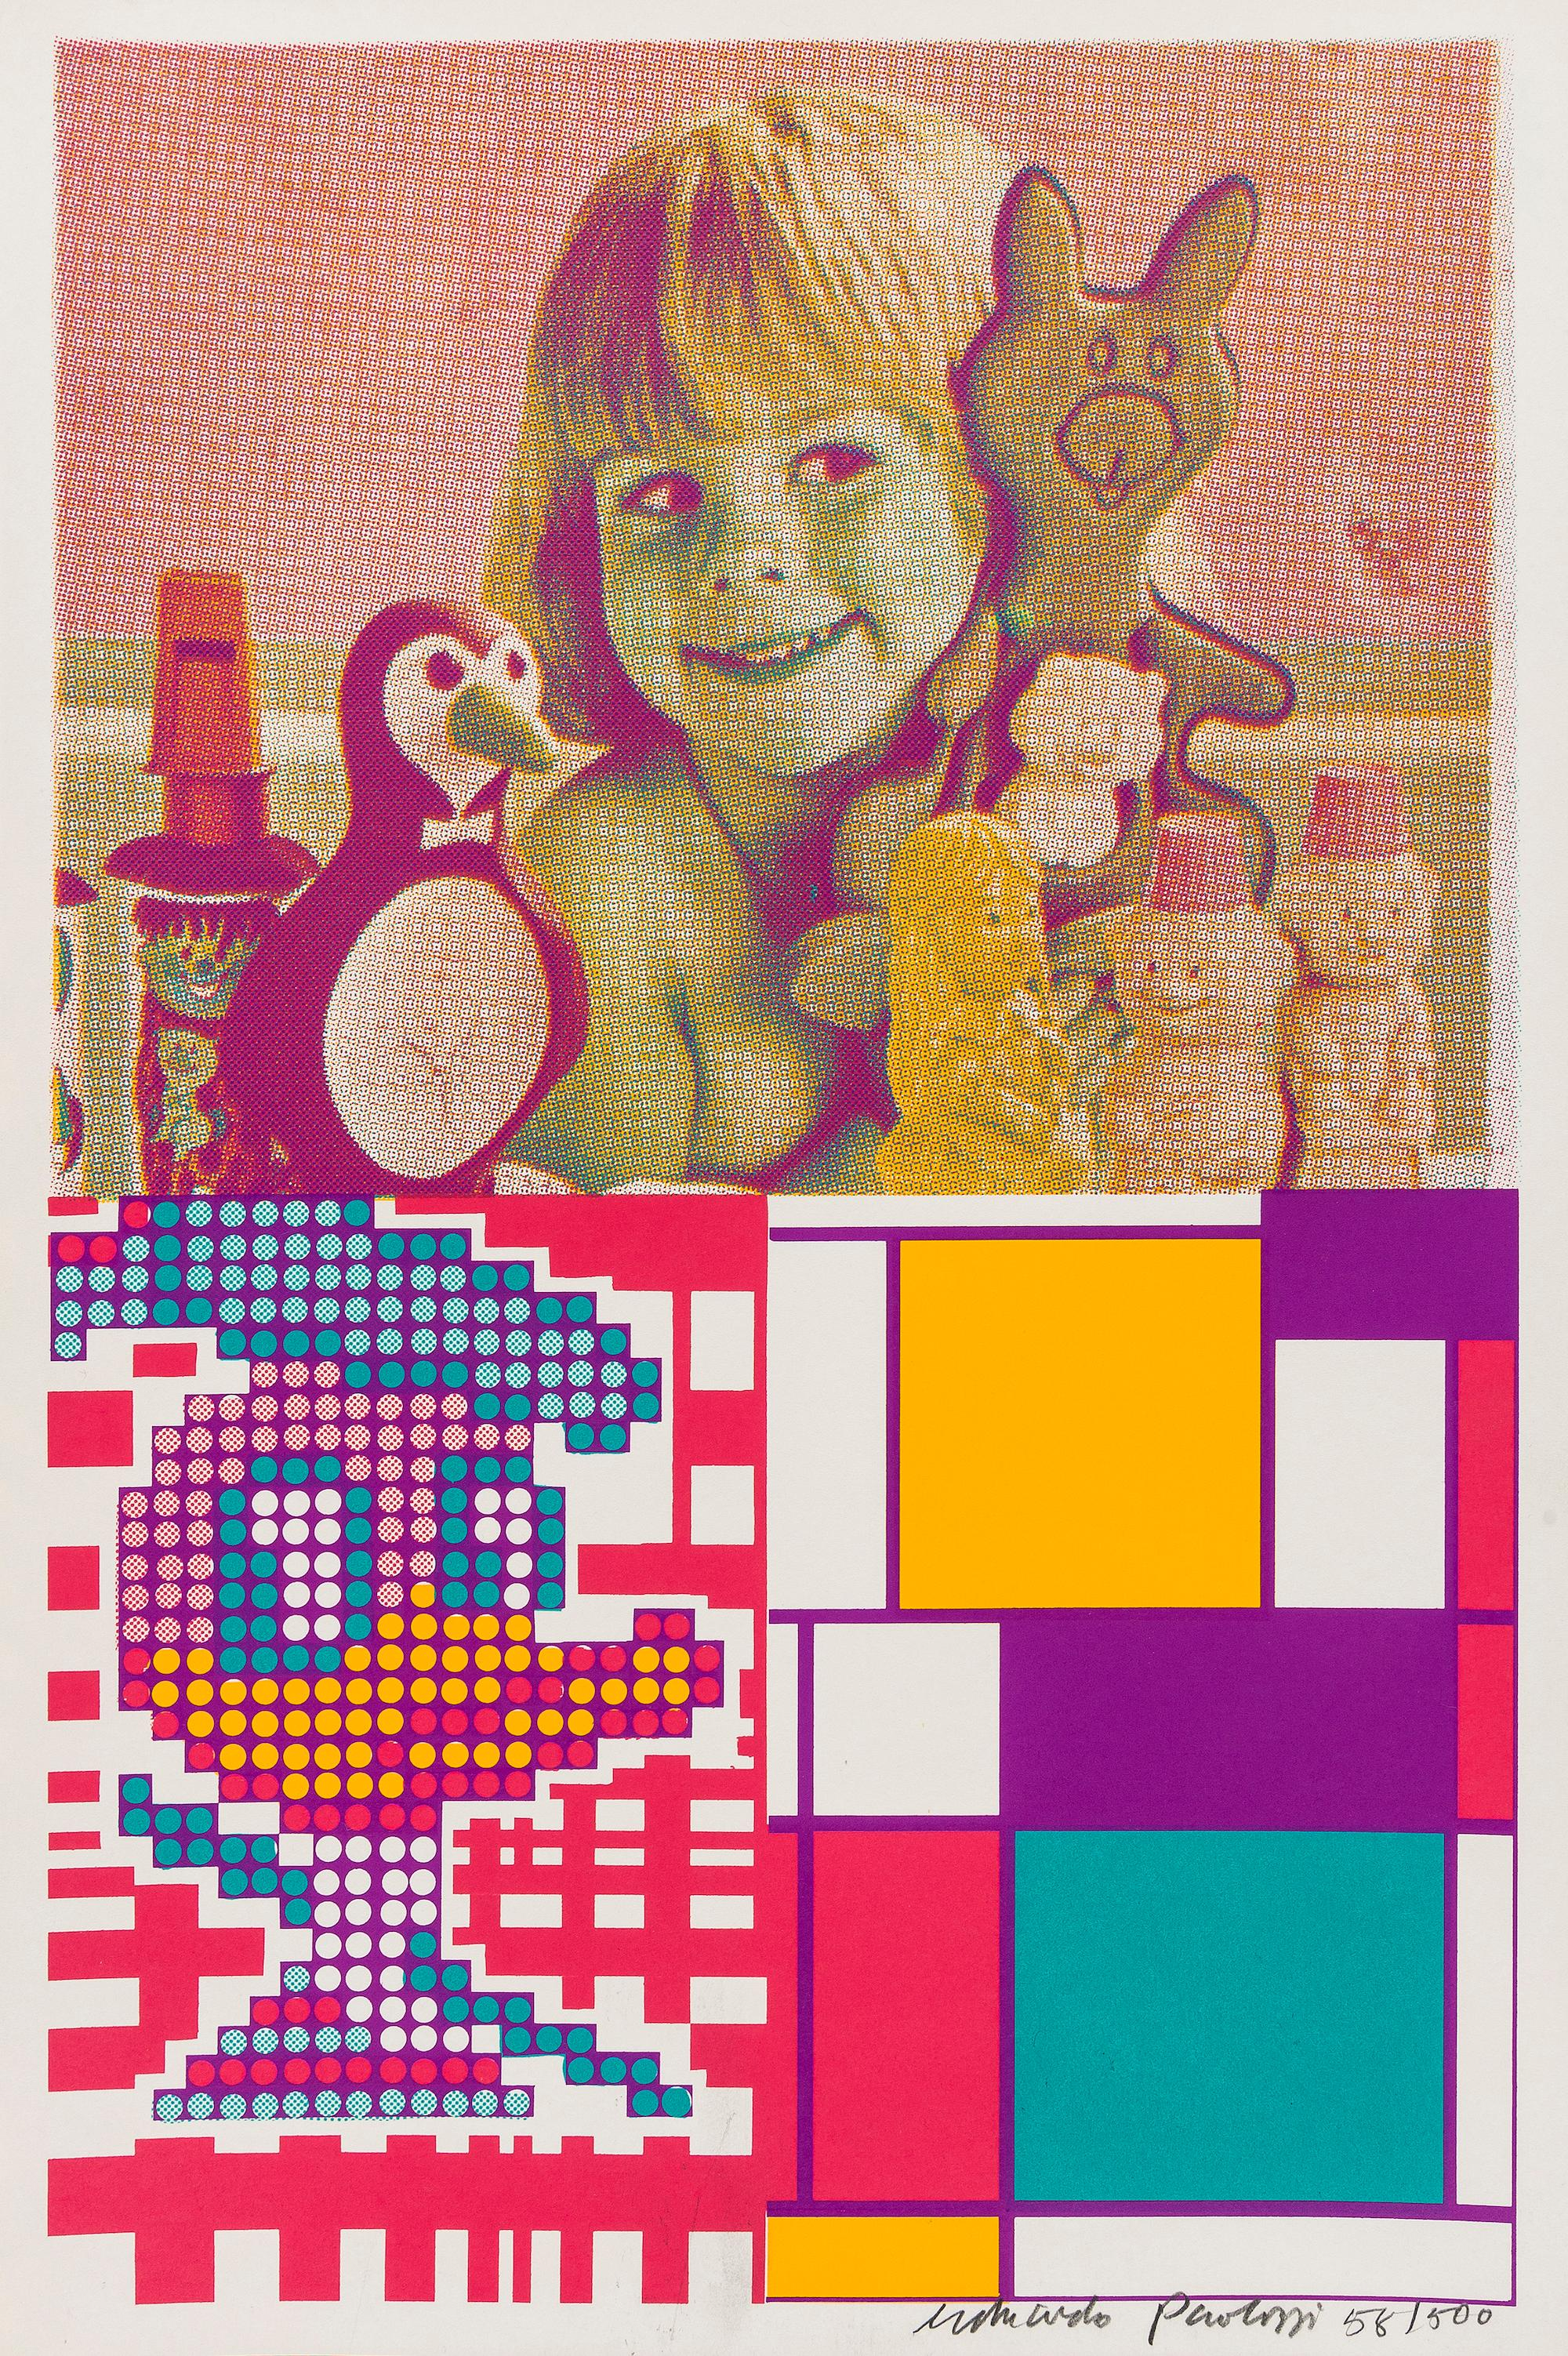 Donald Duck Meets Mondrian -- Print, Patterns, Pop Art by Eduardo Paolozzi